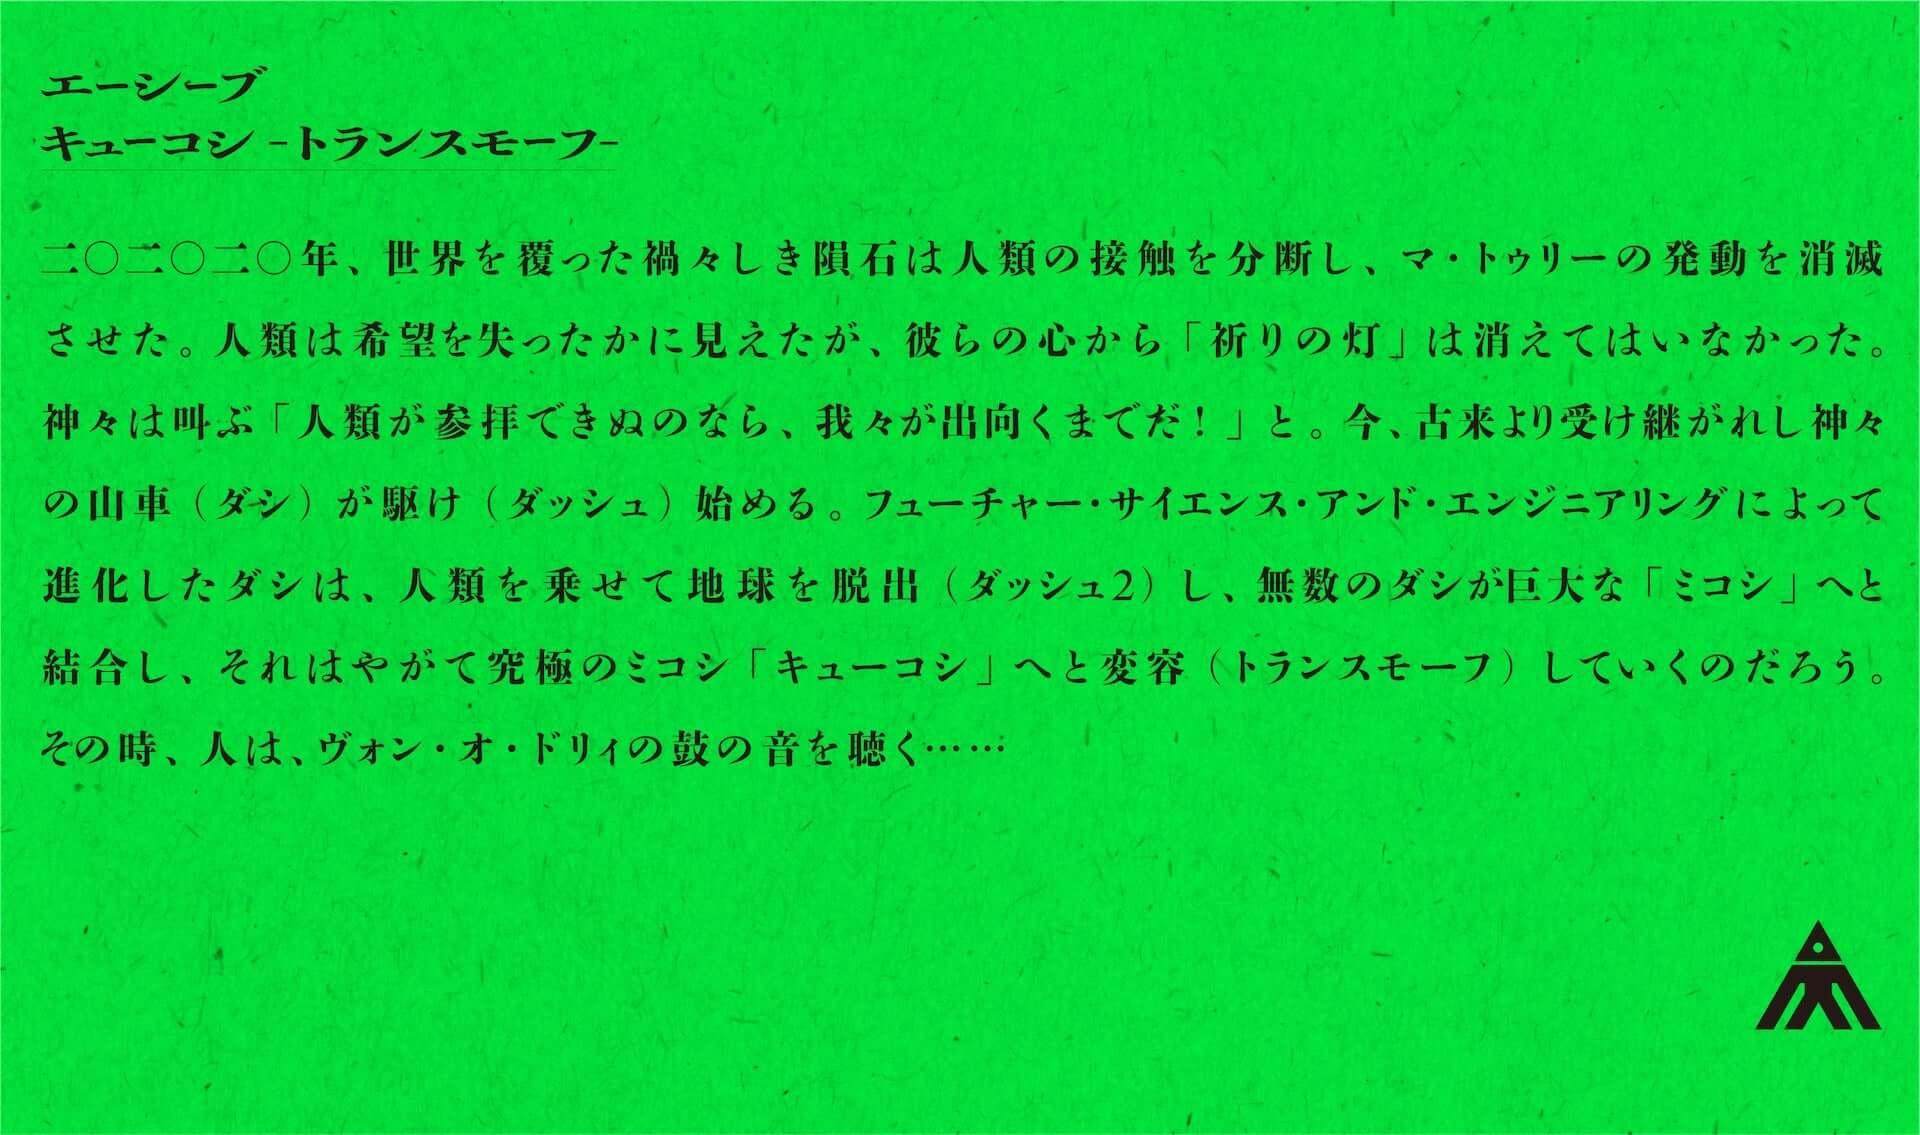 "AC部初の大規模個展<九越 -Transmorph->が日本橋三越本店で開催決定!Battles""Sugar Foot""『大宇宙ロボット祭』の最新作など展開 art201218_ac-bu_1-1920x1135"